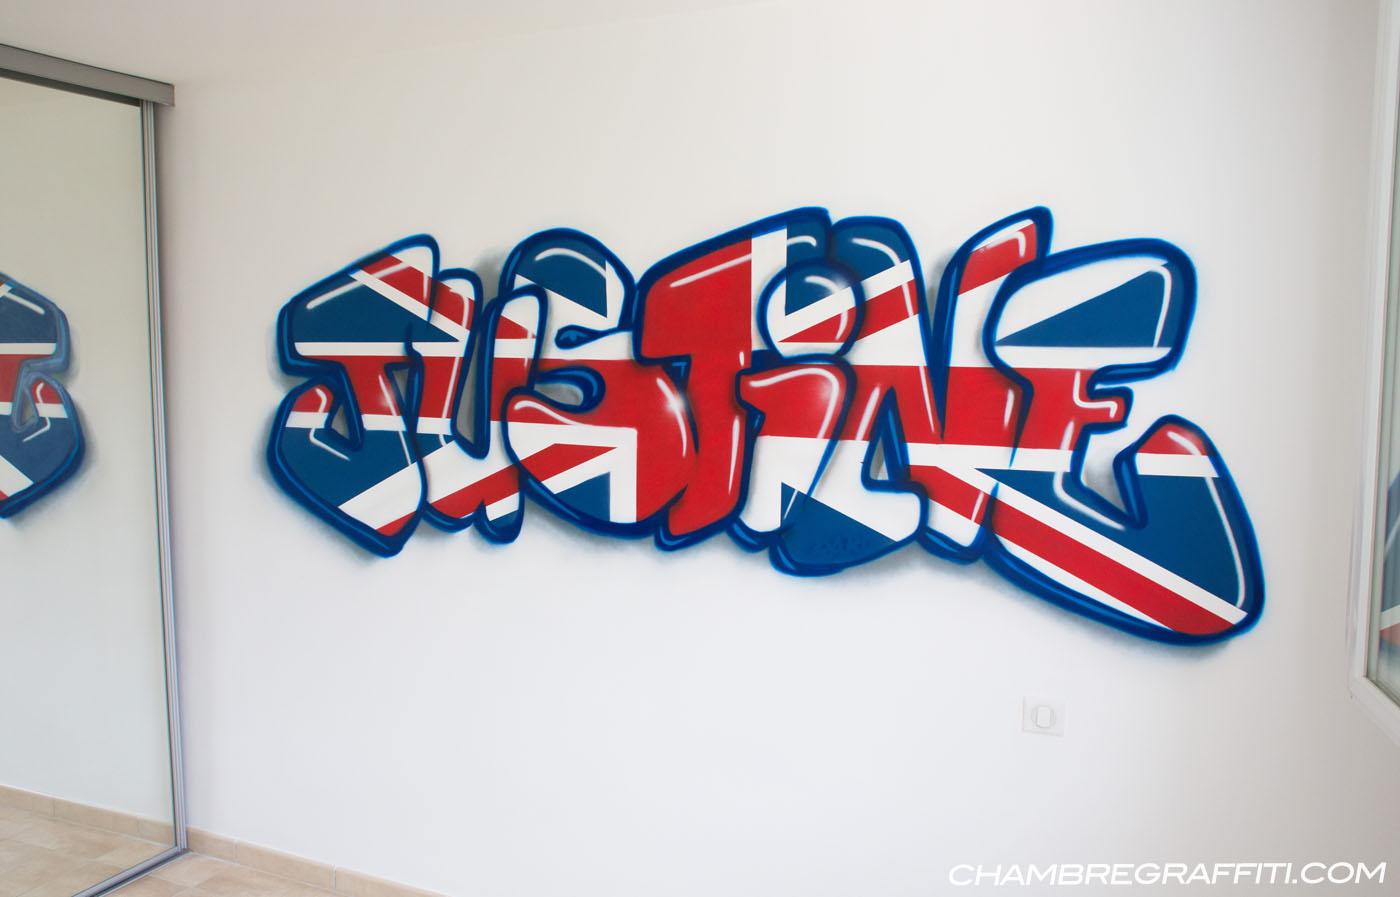 Chambre de Justine en France | Chambre graffiti